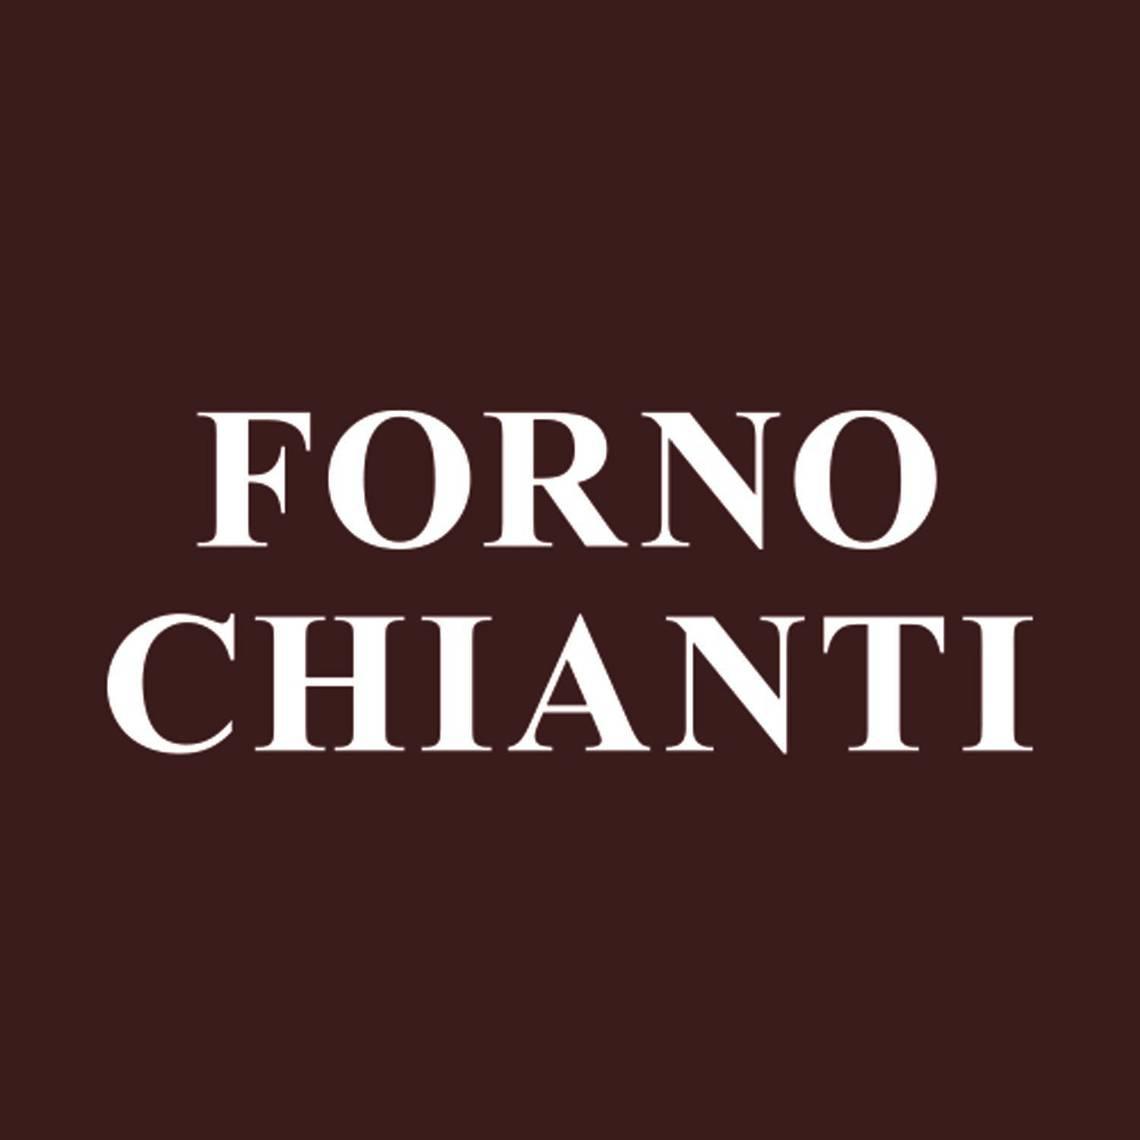 Forno Chianti Logo.jpg